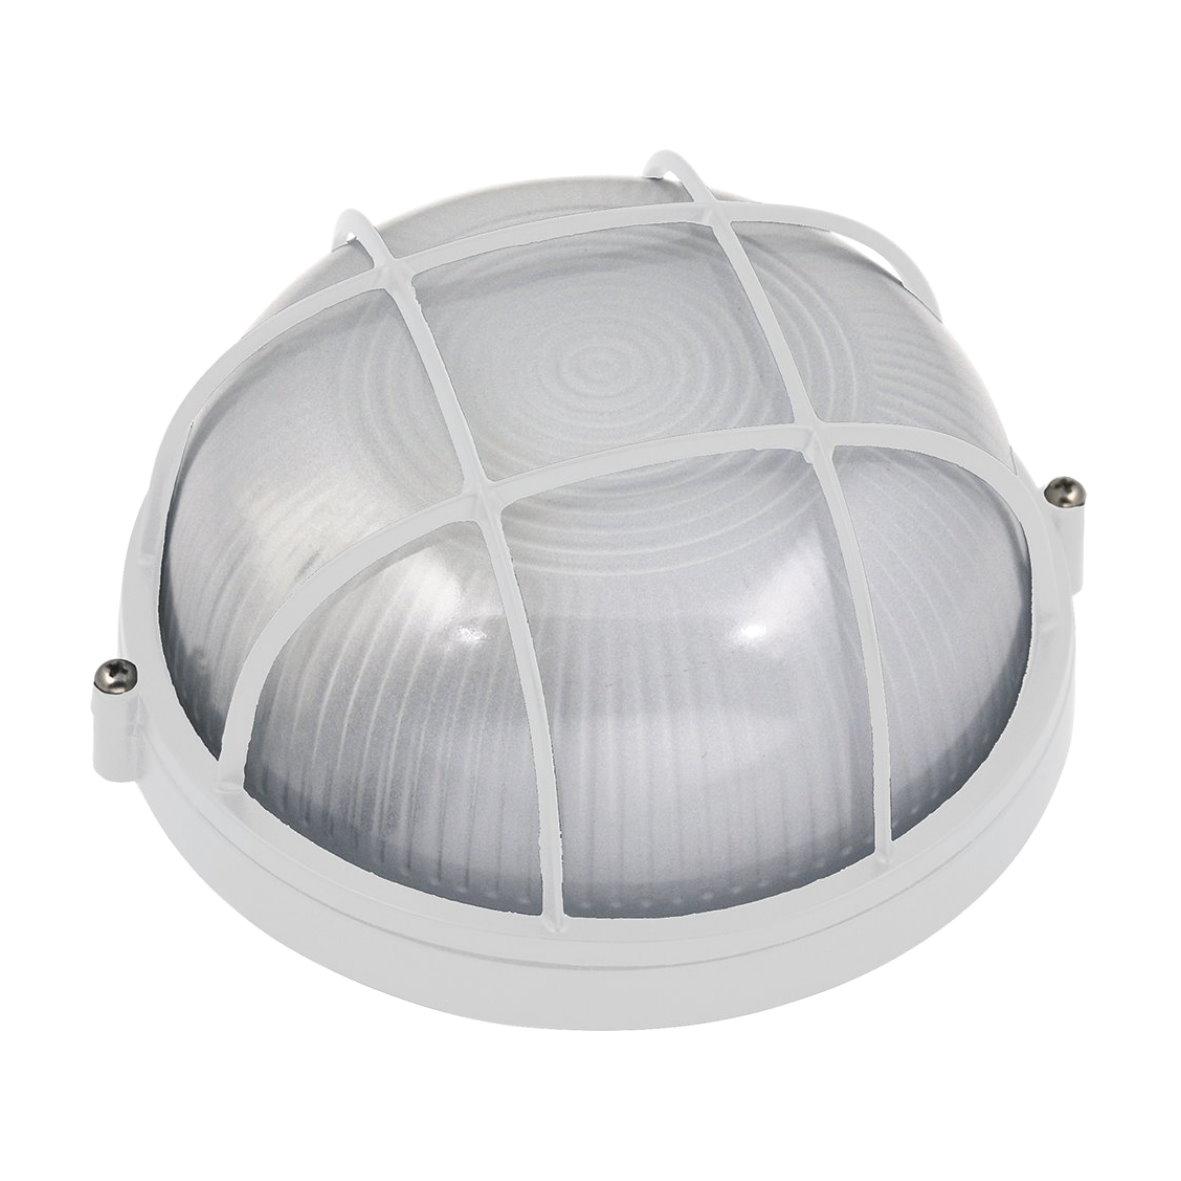 aluminium kellerleuchte kellerlampe bulkhead ip54 keller lampe leuchte aussen. Black Bedroom Furniture Sets. Home Design Ideas